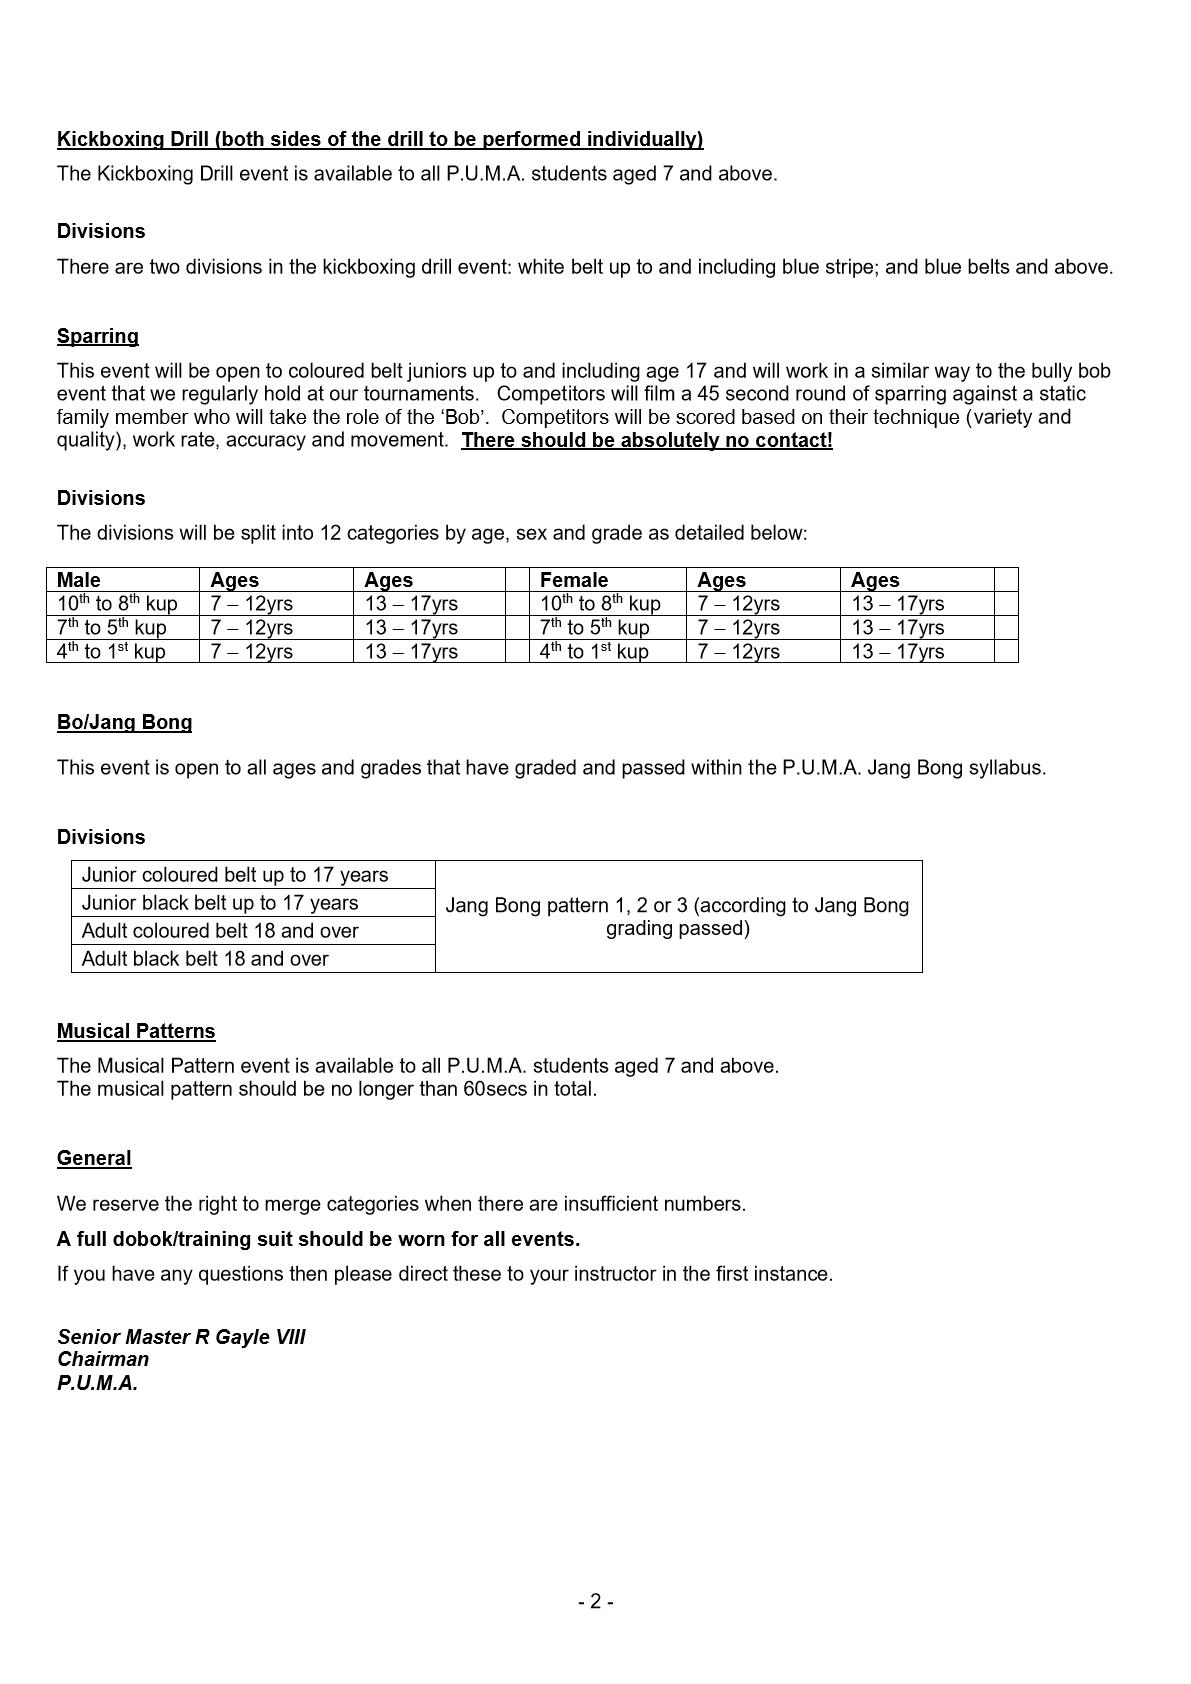 PUMA English championships information